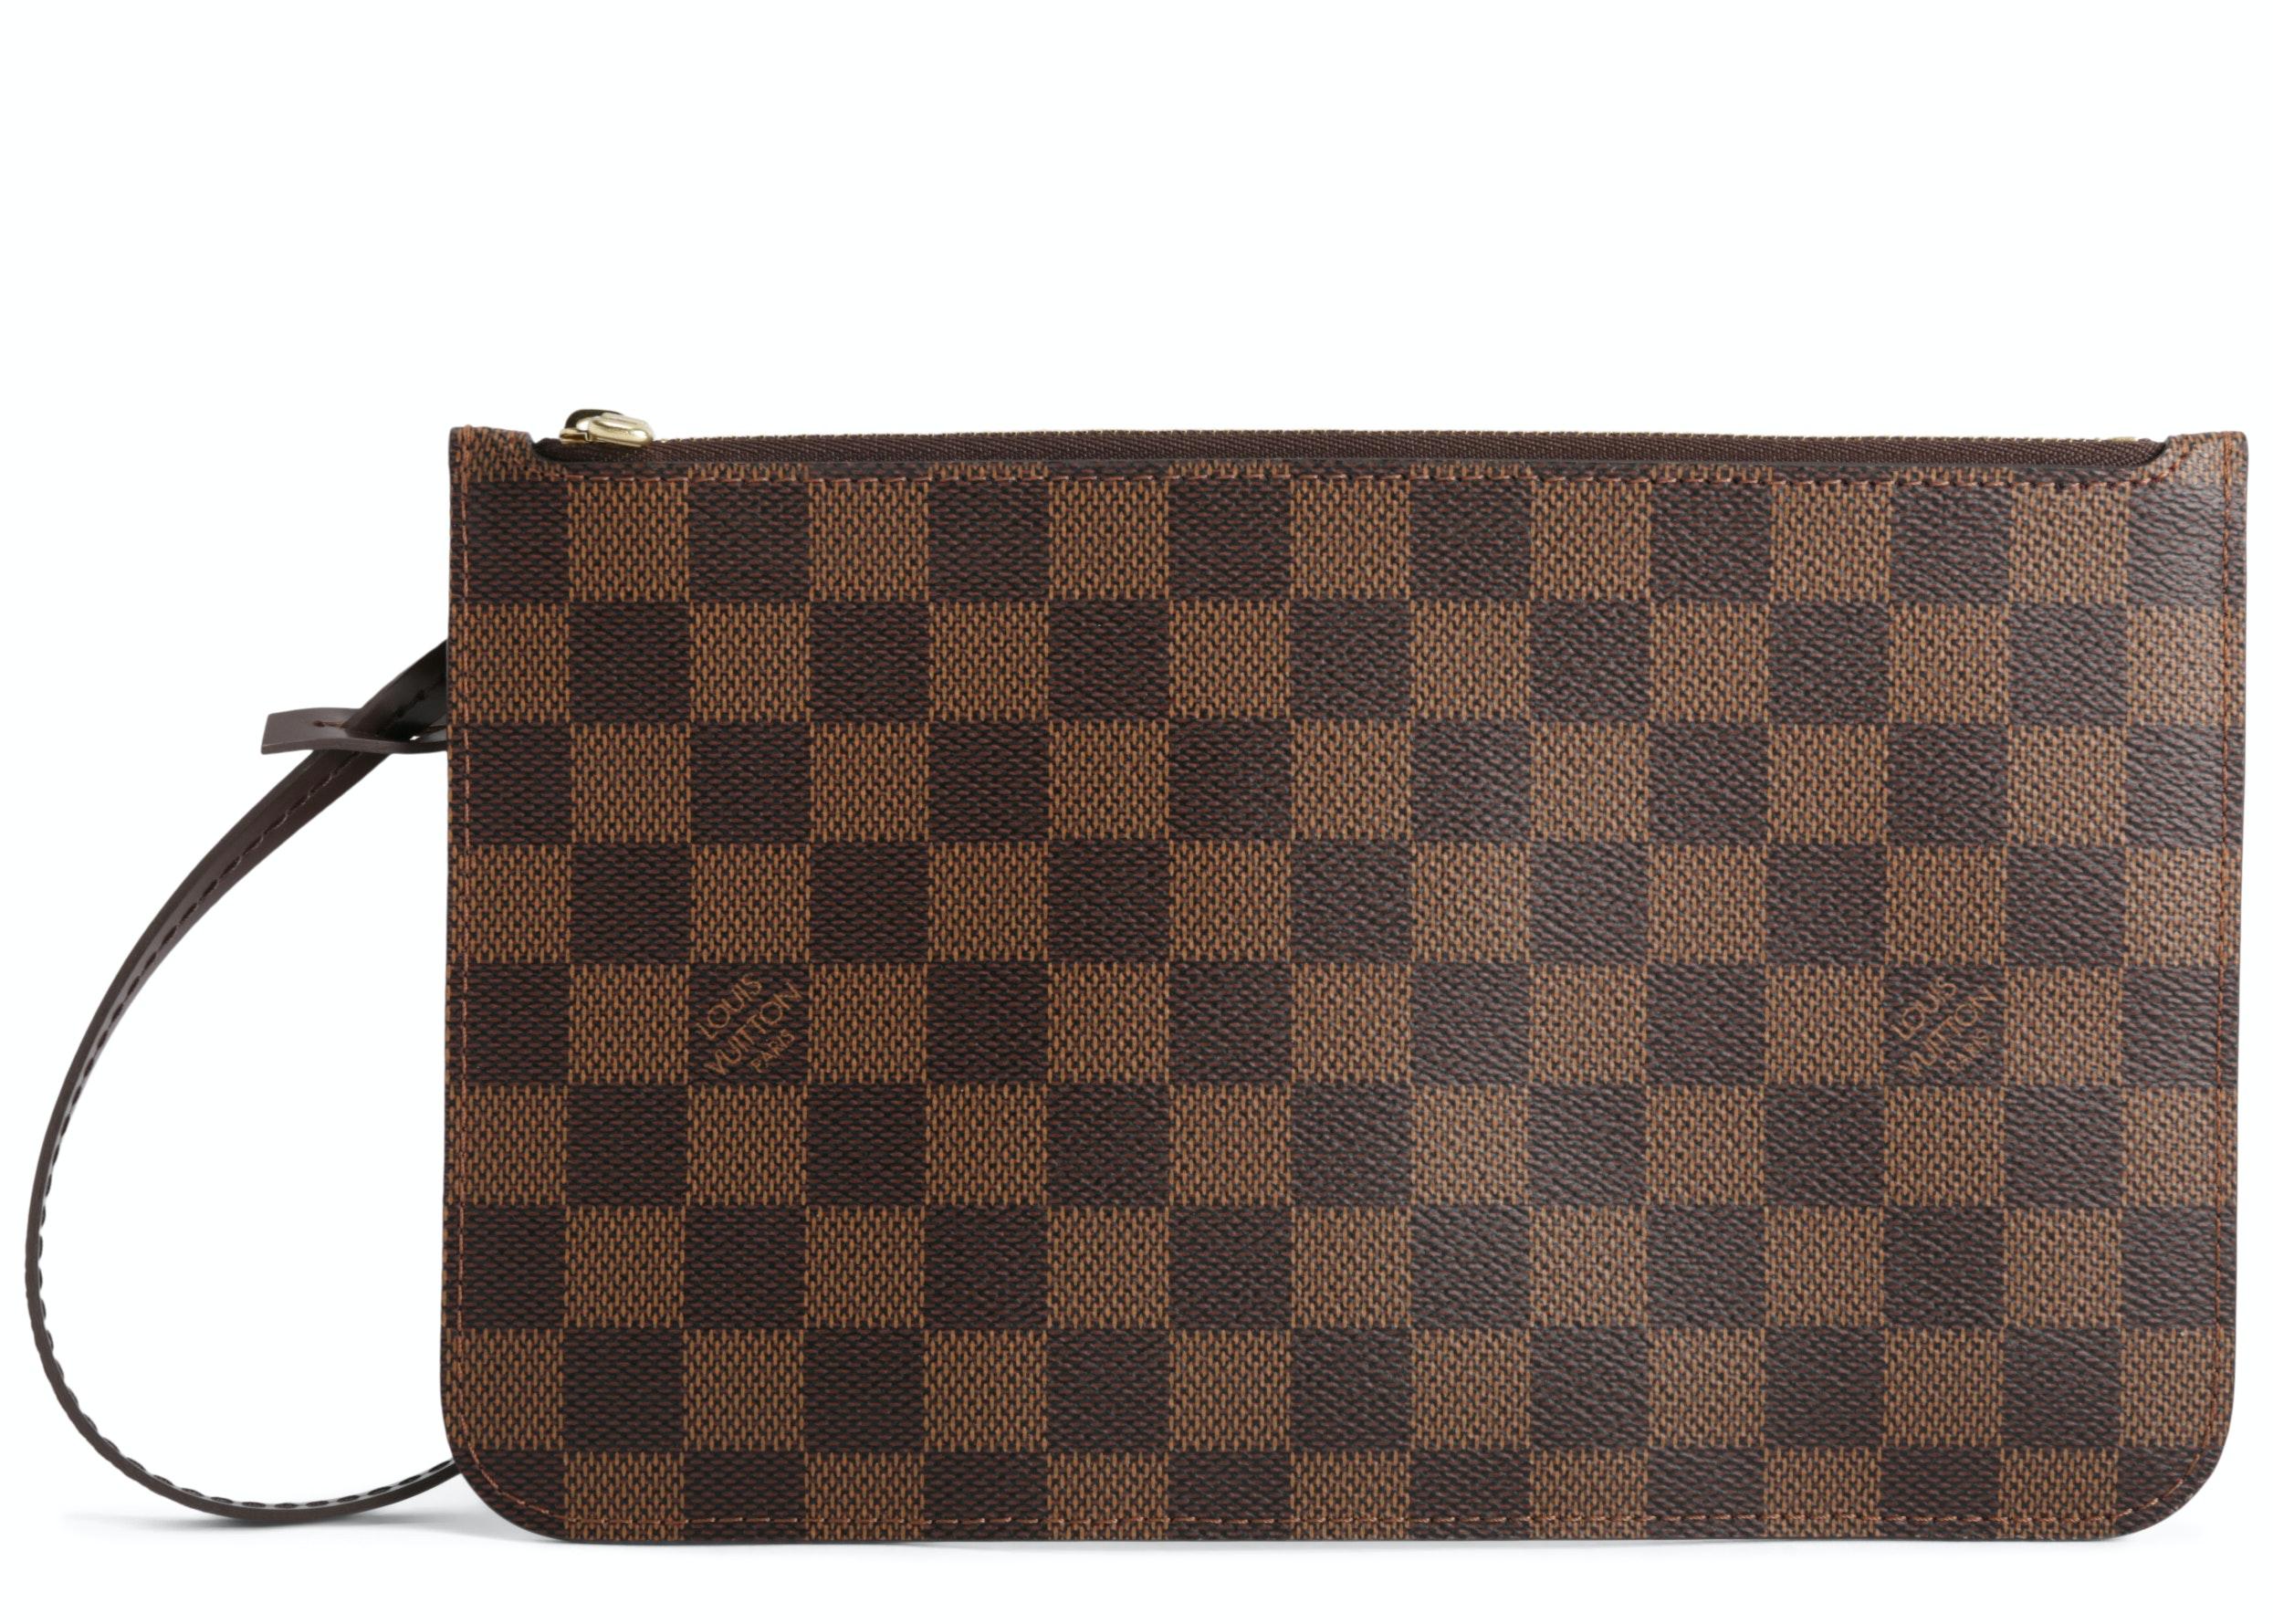 Louis Vuitton Pochette Neverfull Damier Ebene (With Strap) MM/GM Cerise